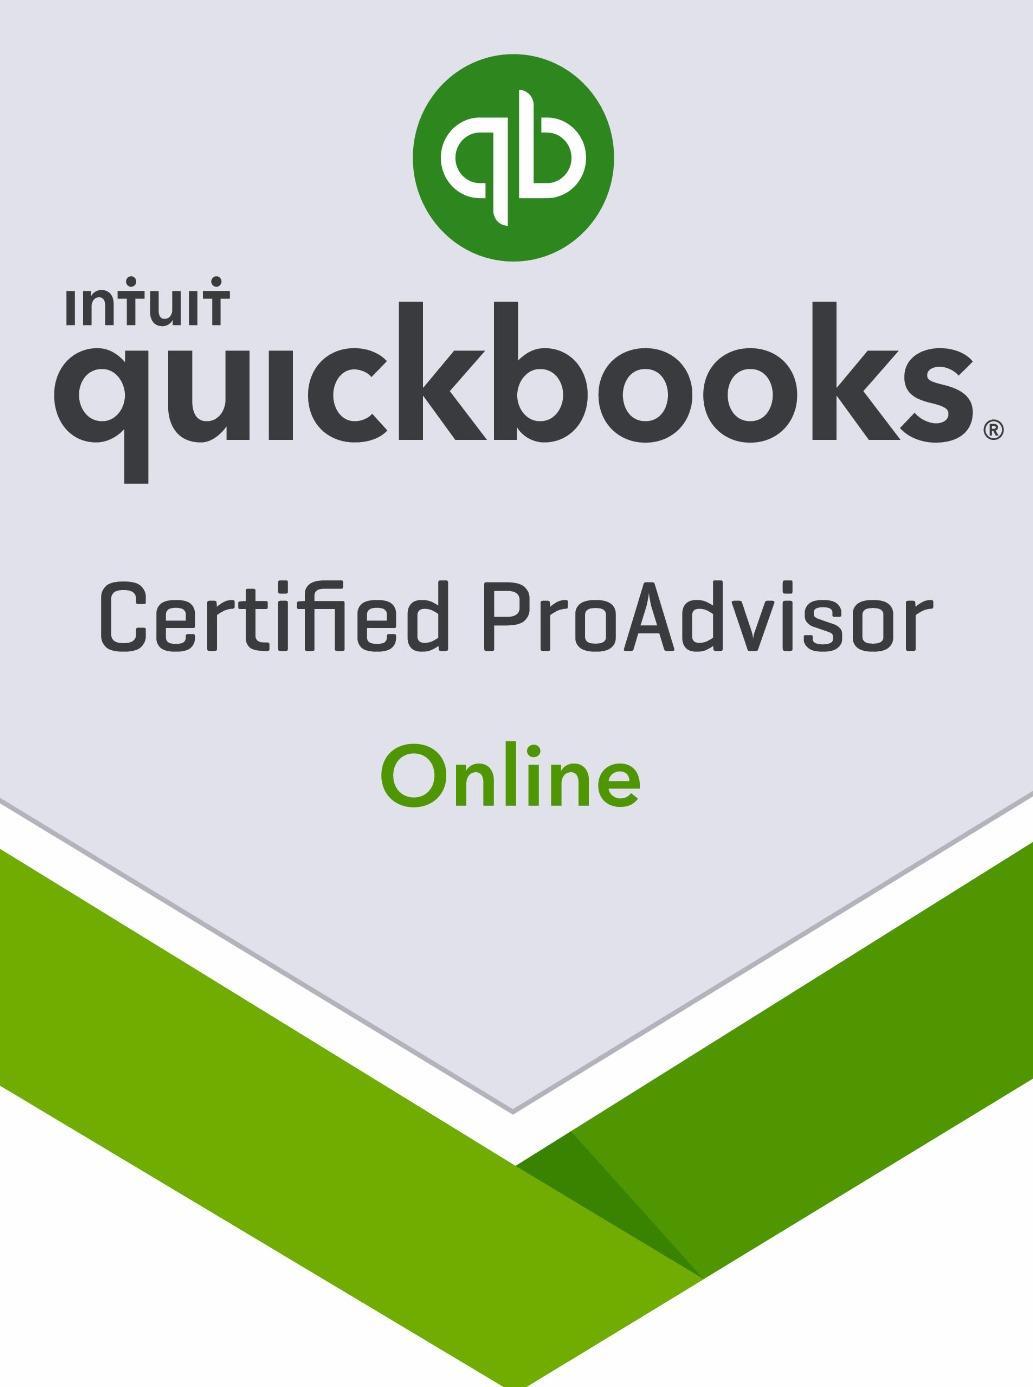 Quickbooks system set-up